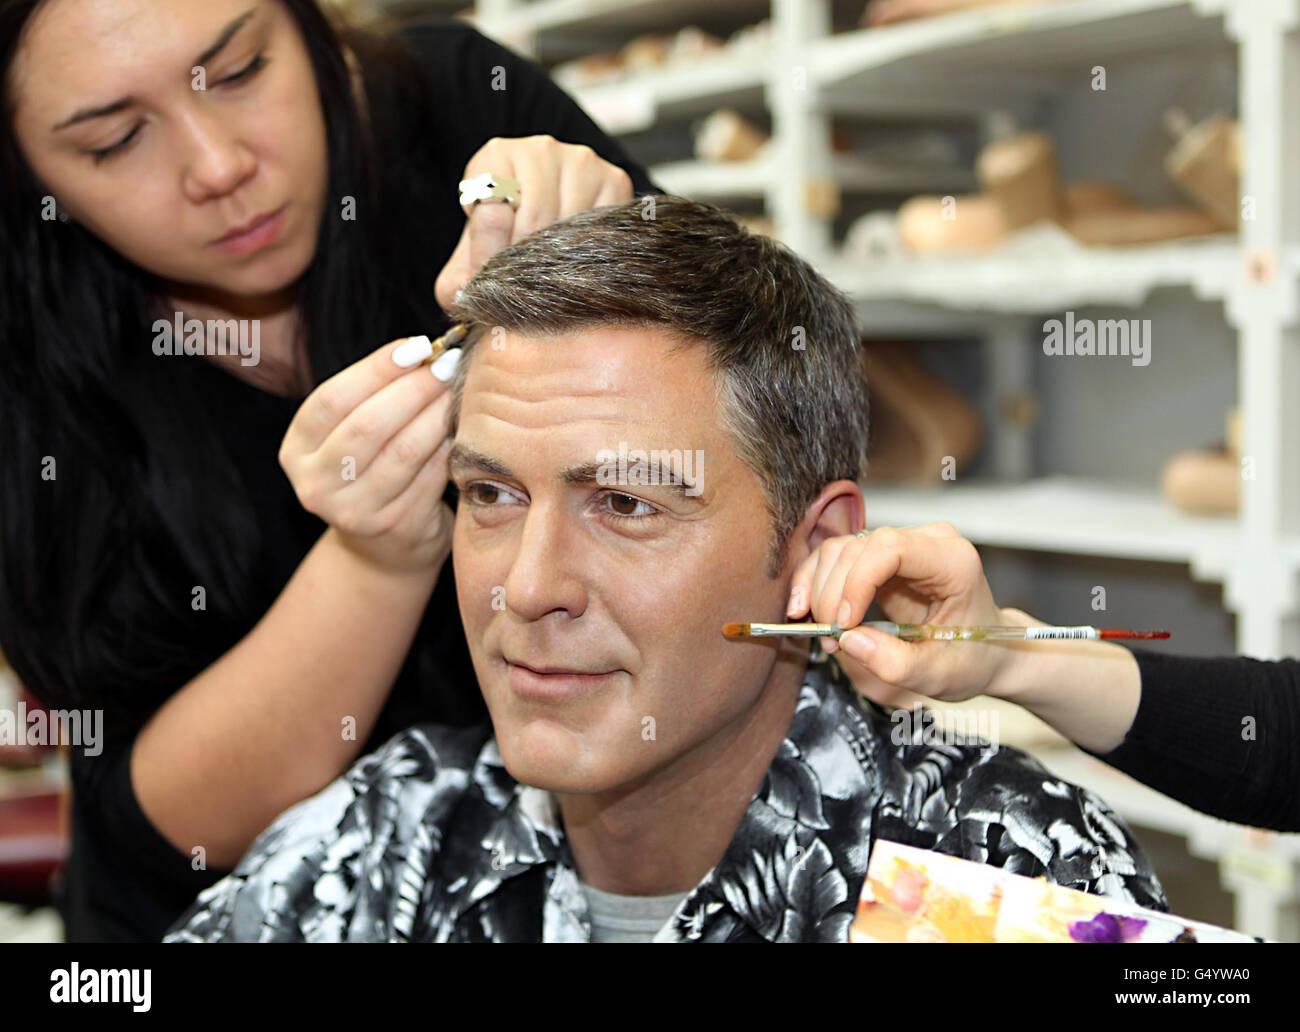 George Clooney wax figure - Stock Image